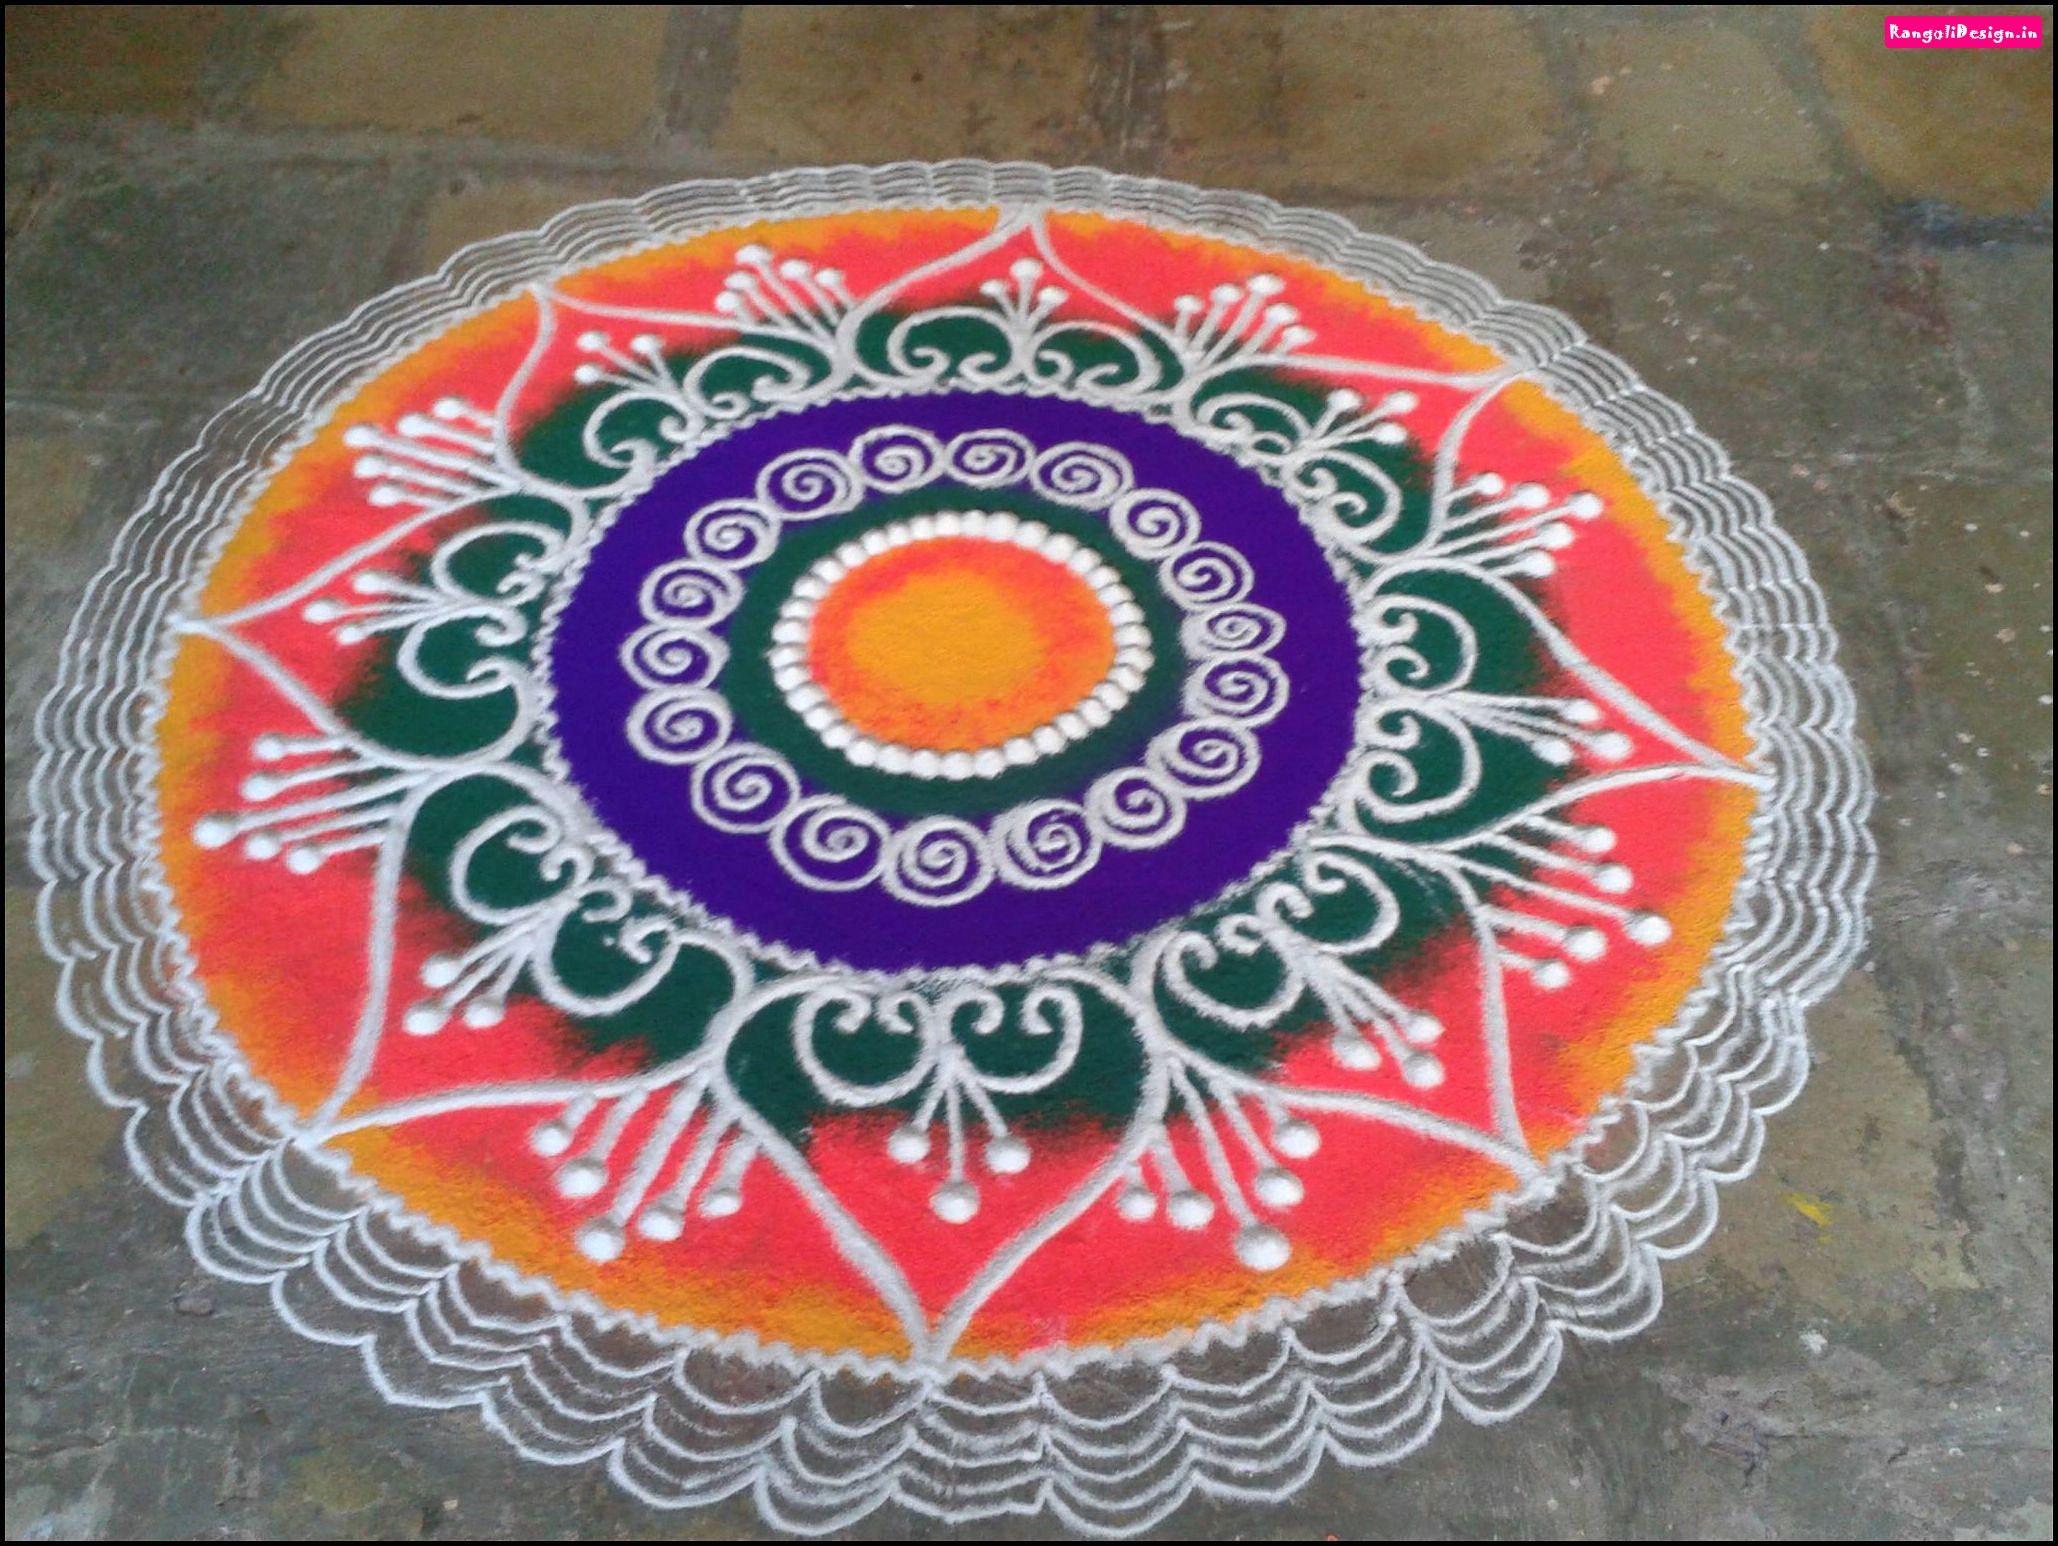 Amazing Rangoli Designs With Theme Go for Rangoli Designs With Theme Go Green  17lplyp